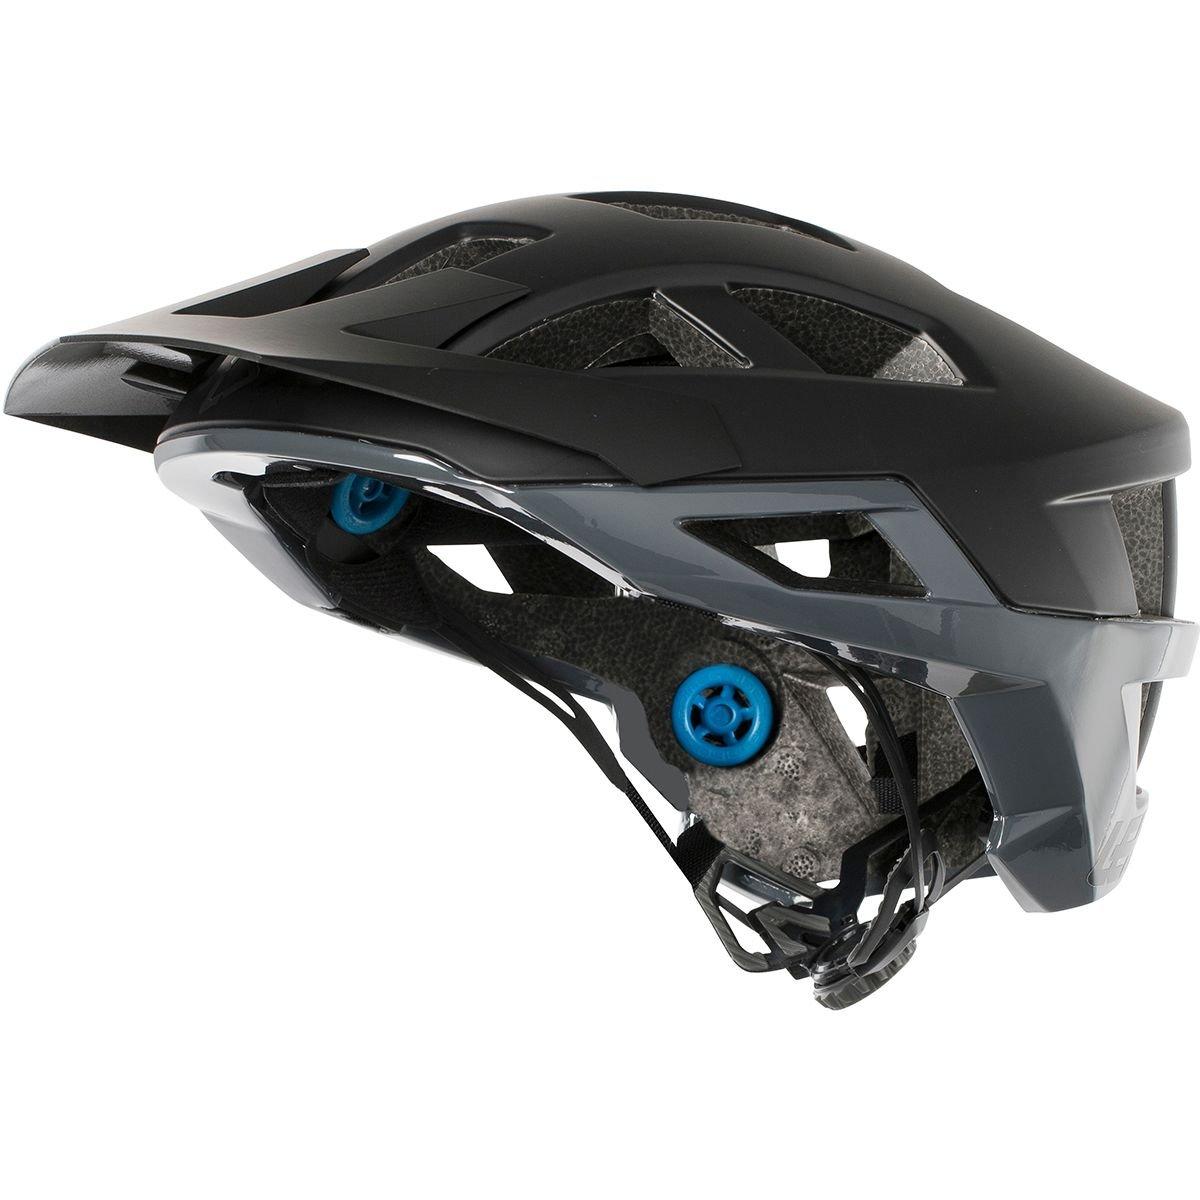 Leatt 2.0 DBXヘルメットブラック/グラナイト、M   B0779W97XN